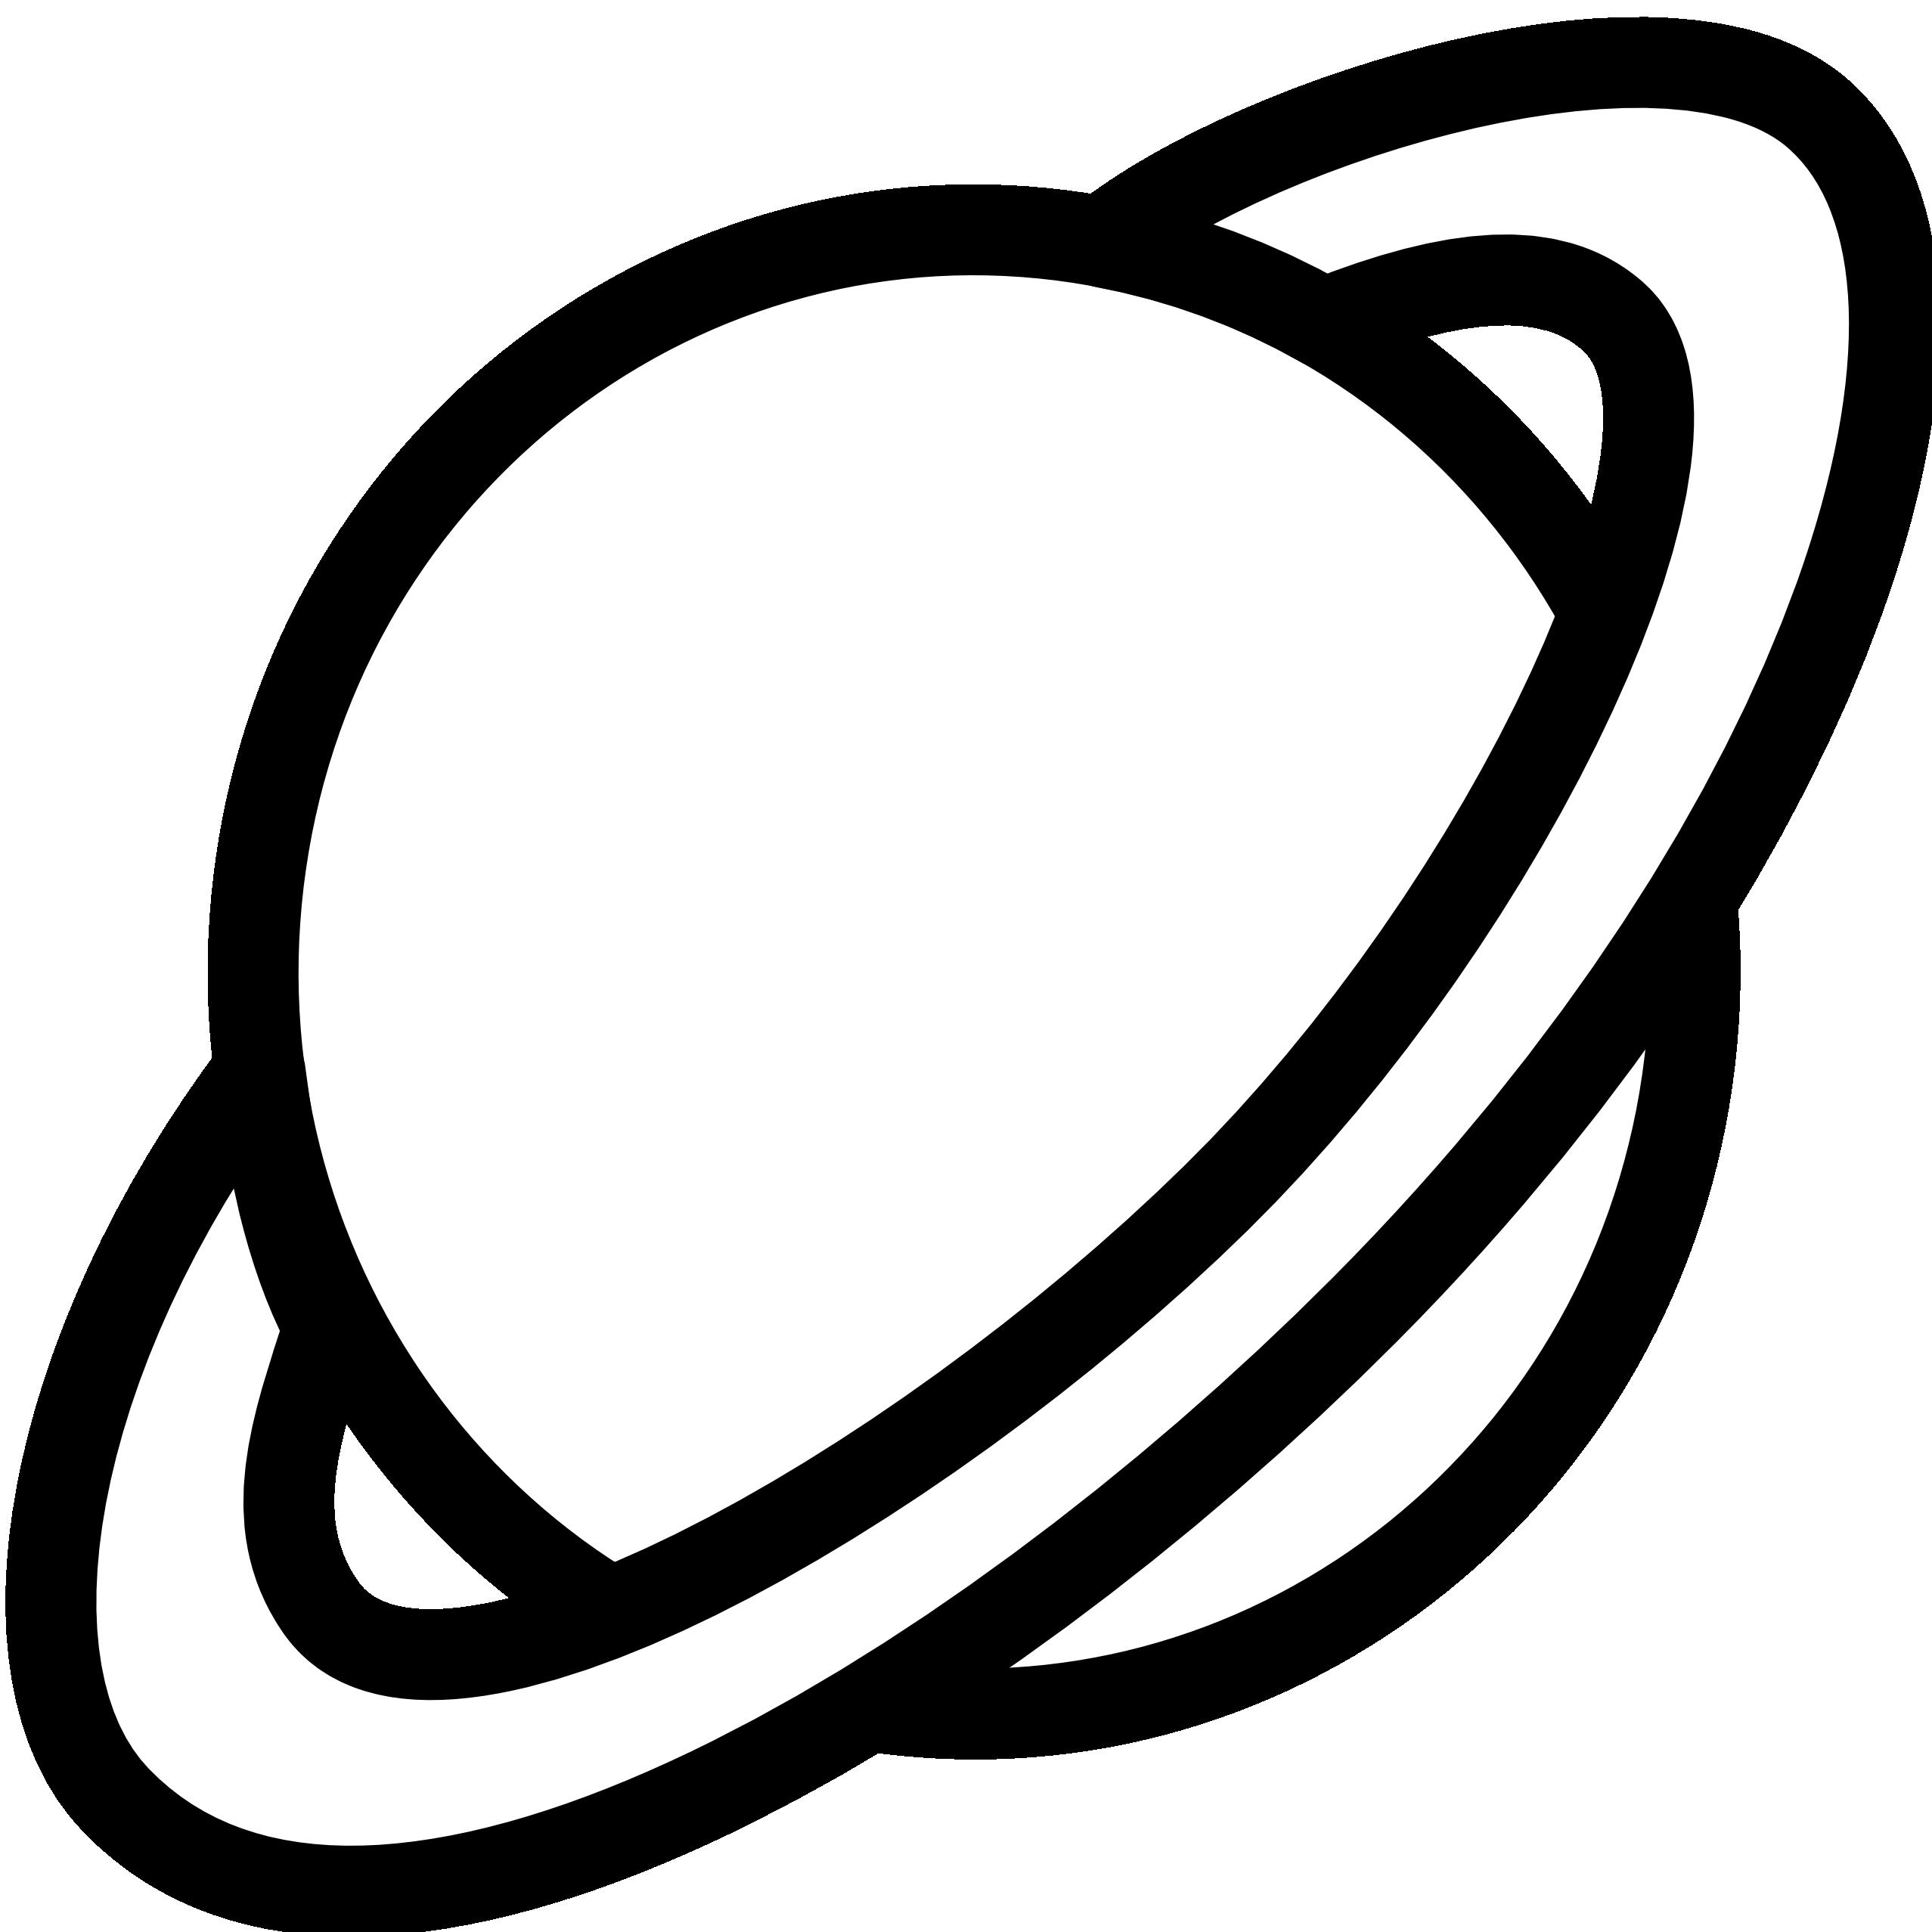 2555x2555 Planets Clip Art Black And White Clipart Panda